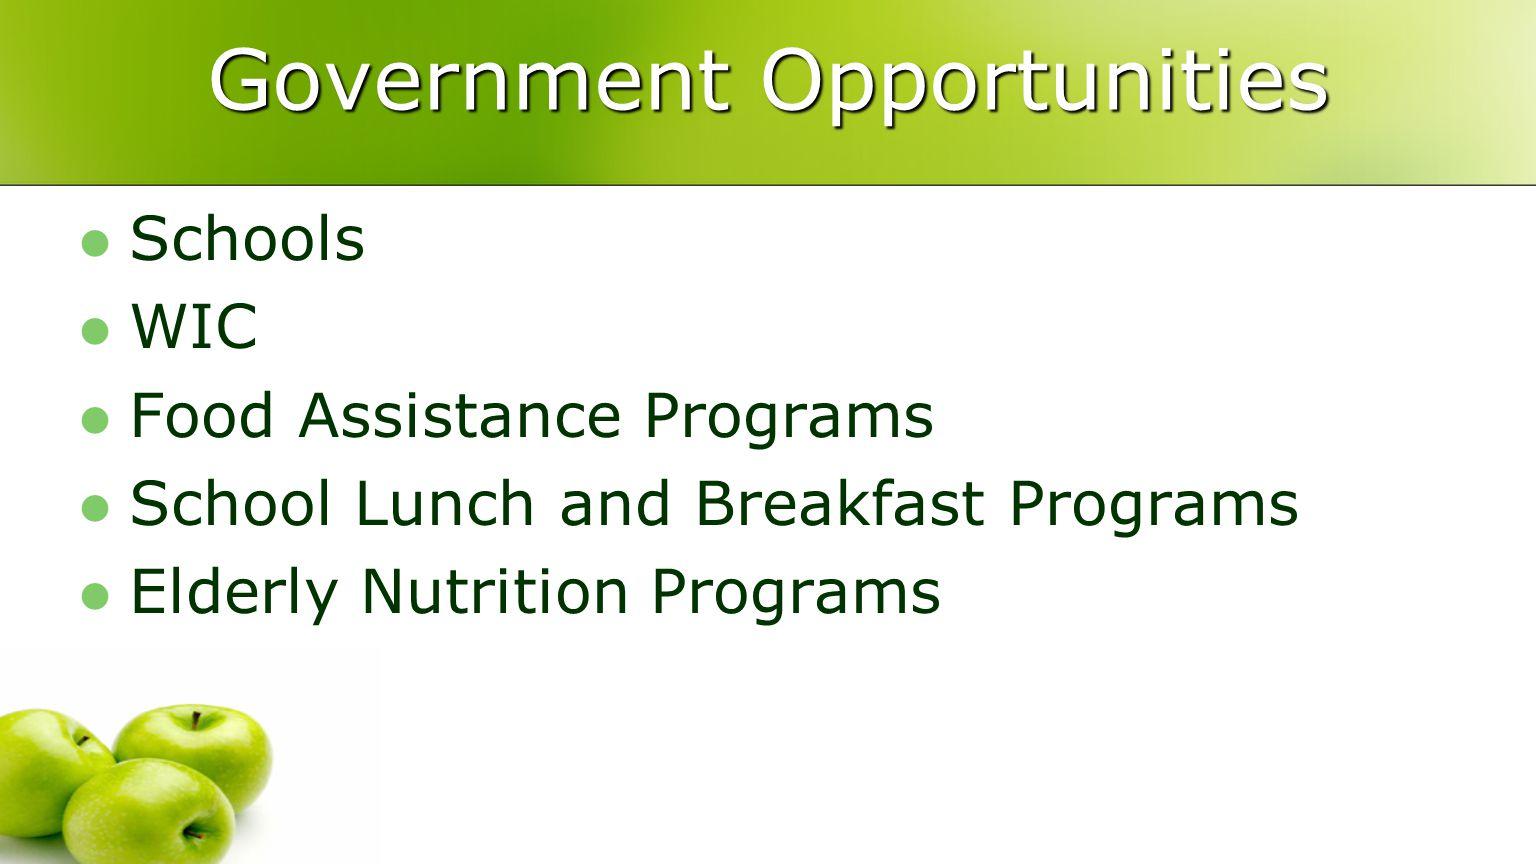 Government Opportunities Schools WIC Food Assistance Programs School Lunch and Breakfast Programs Elderly Nutrition Programs